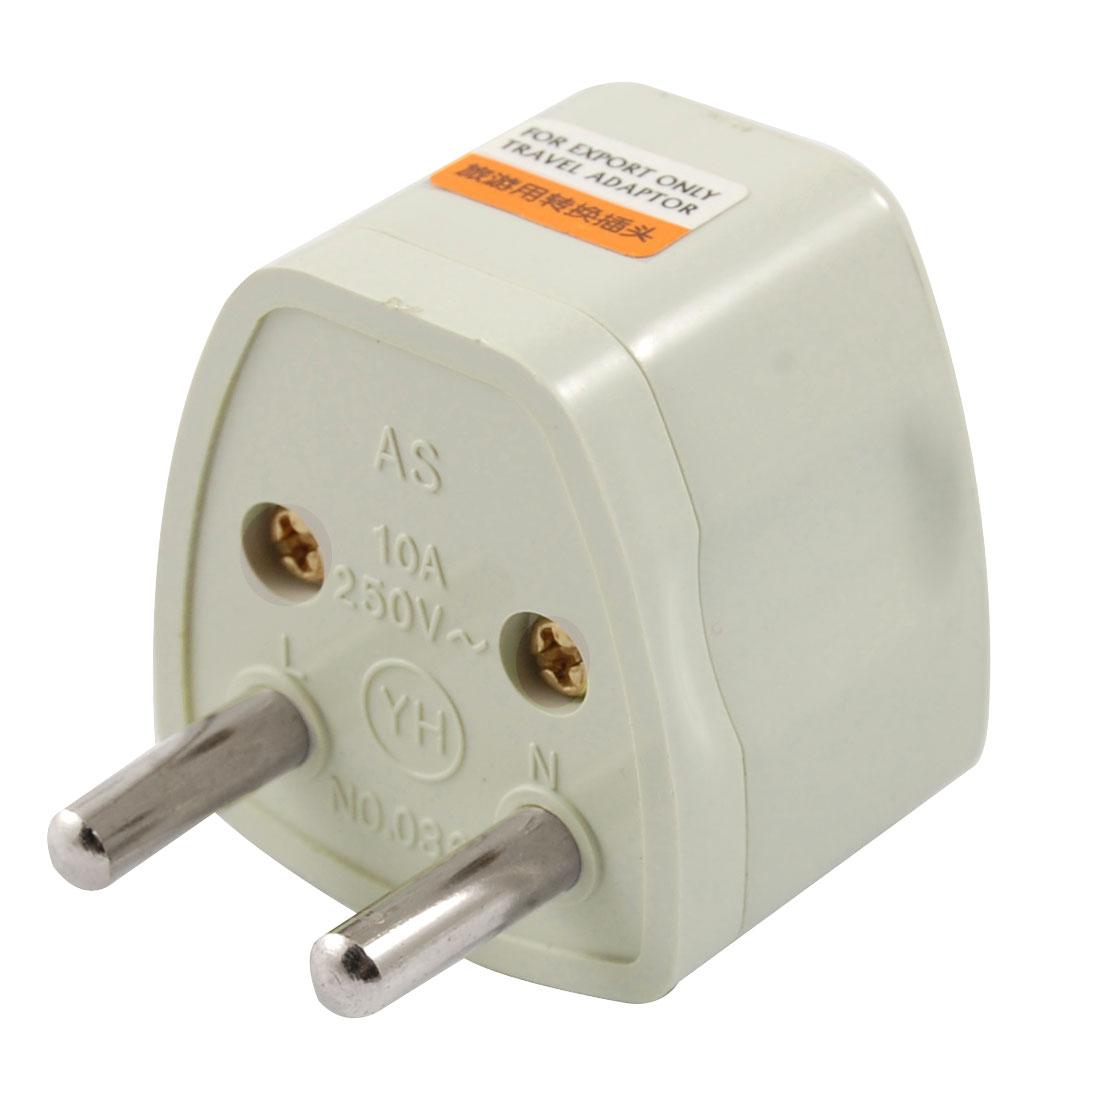 Travel UK US AU Socket to EU 2 Round Pin Plug Adapter AC 250V 10A